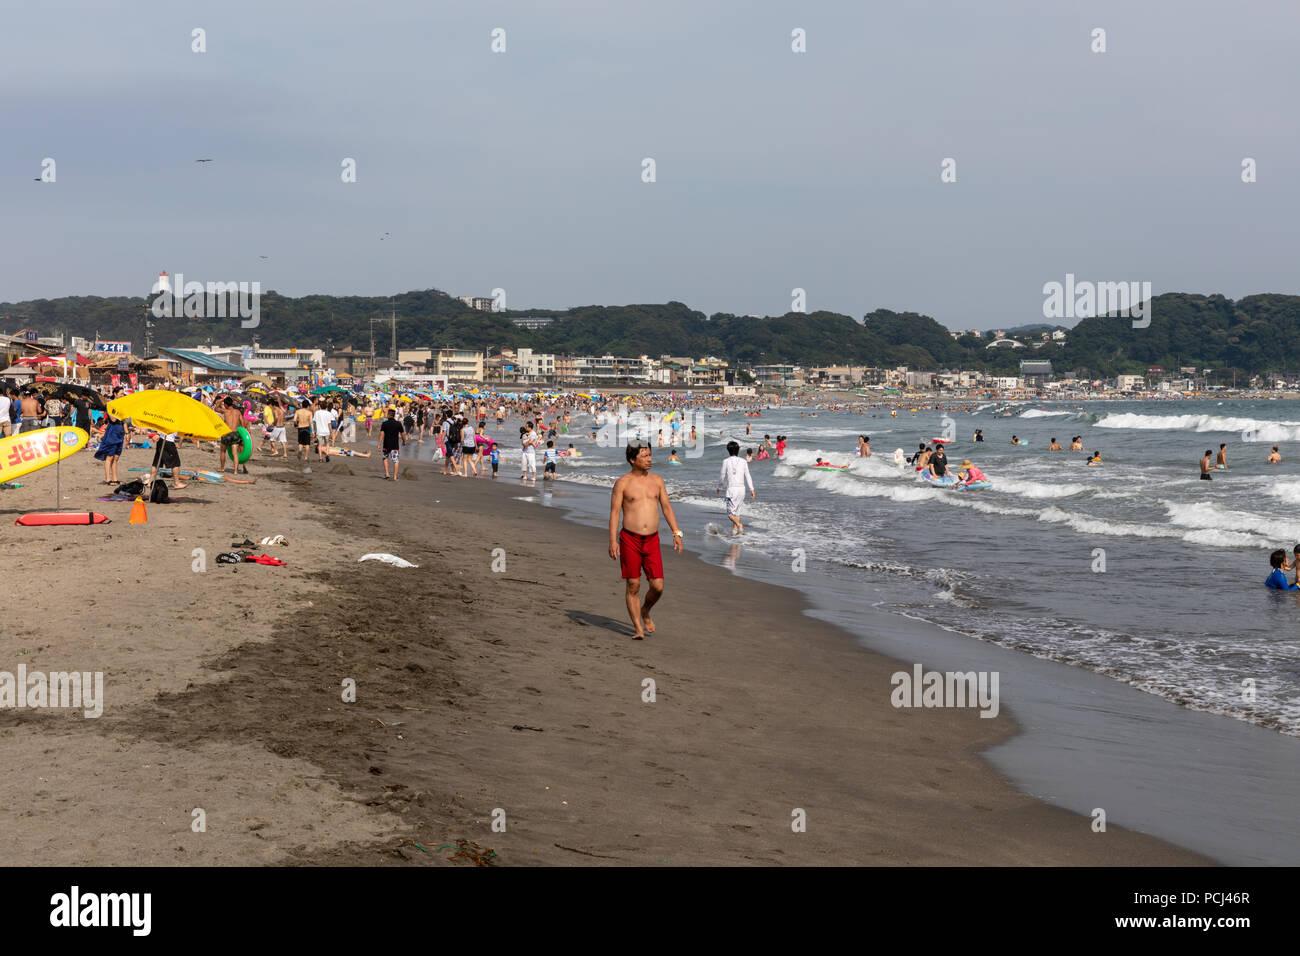 People on Yuigahama Beach, July; Kamakura, Kanagawa Prefecture, Japan - Stock Image